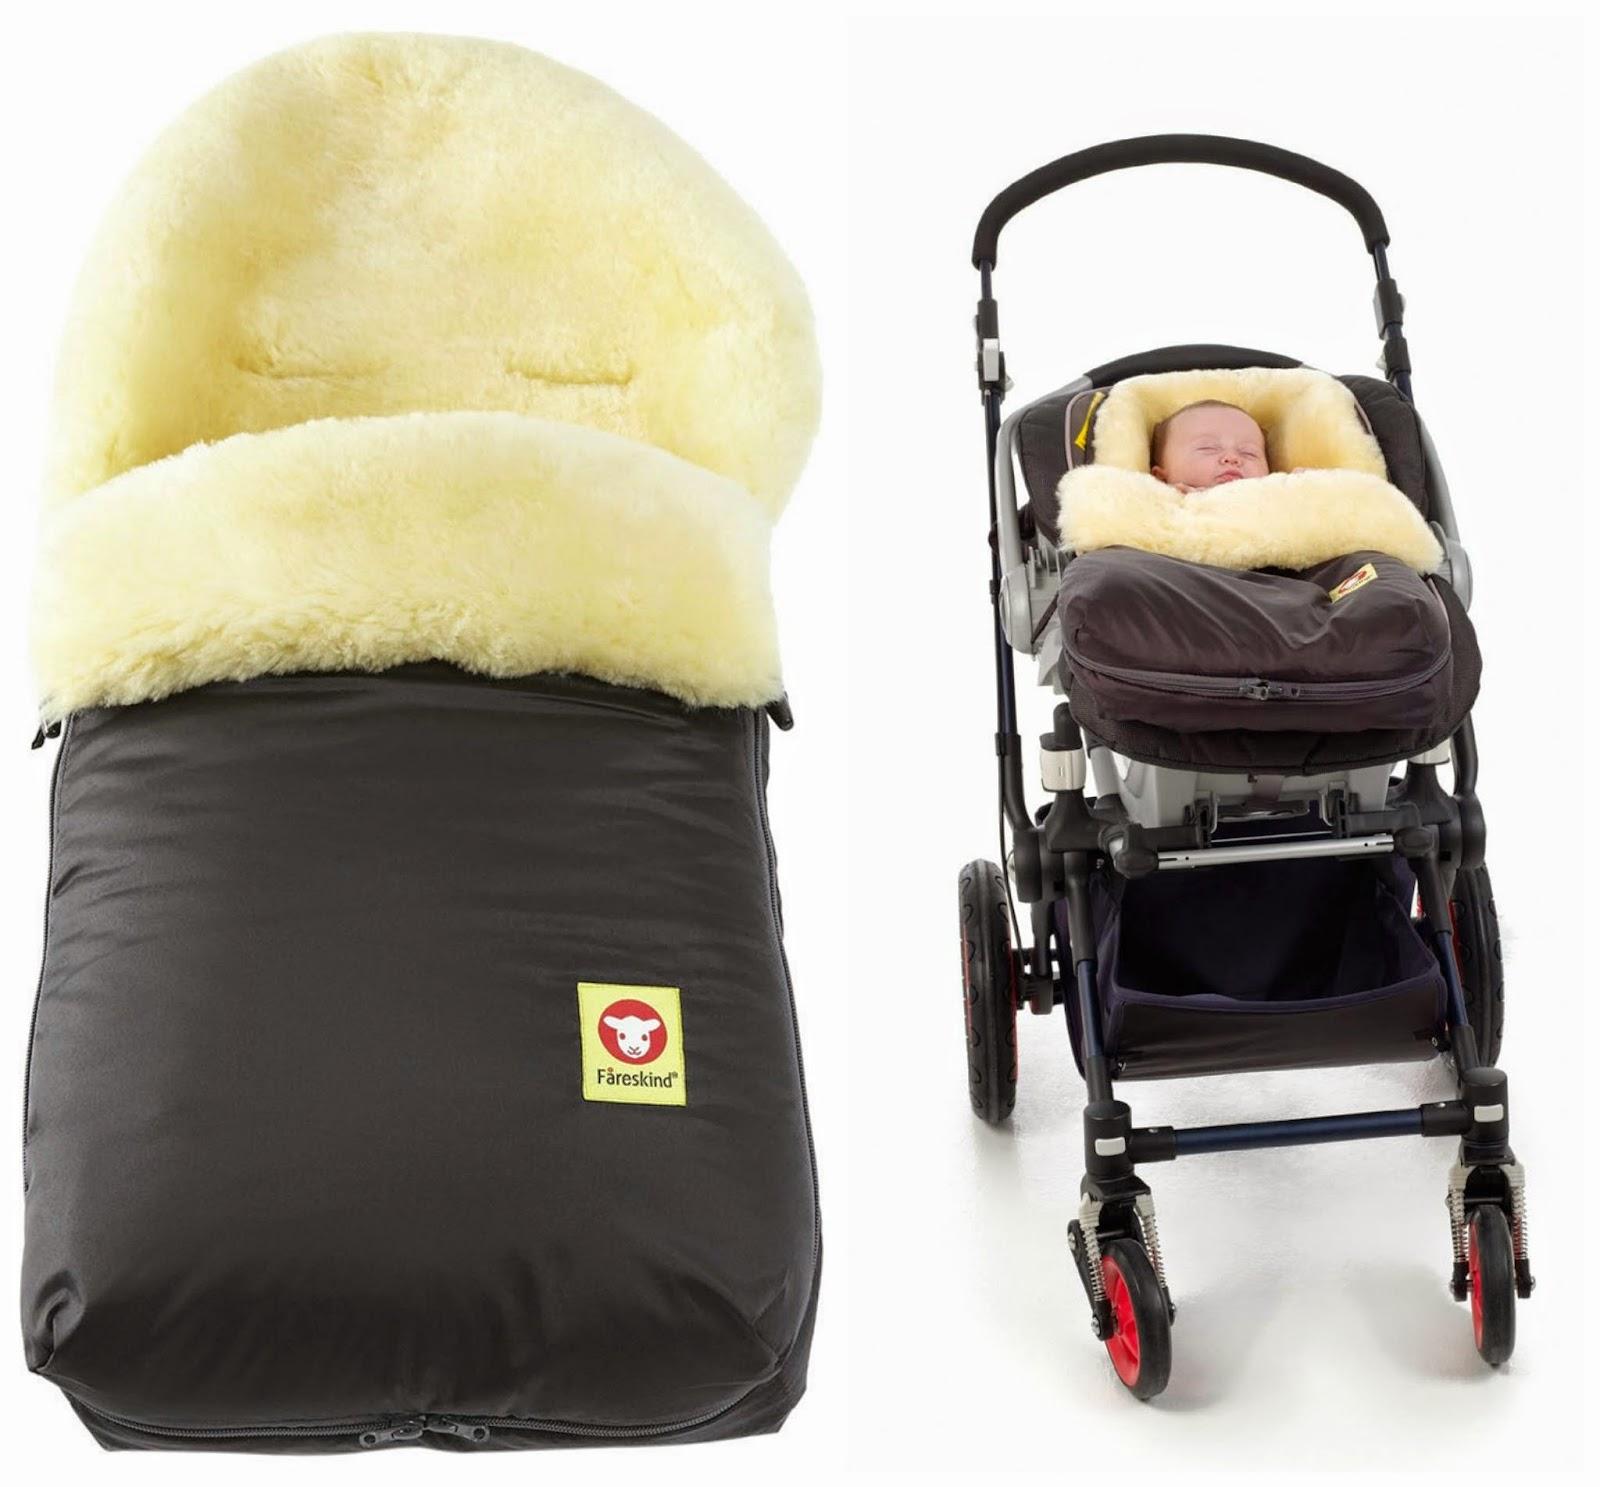 Fareskind Baby Go Cozy Sheepskin Bunting Bag Review